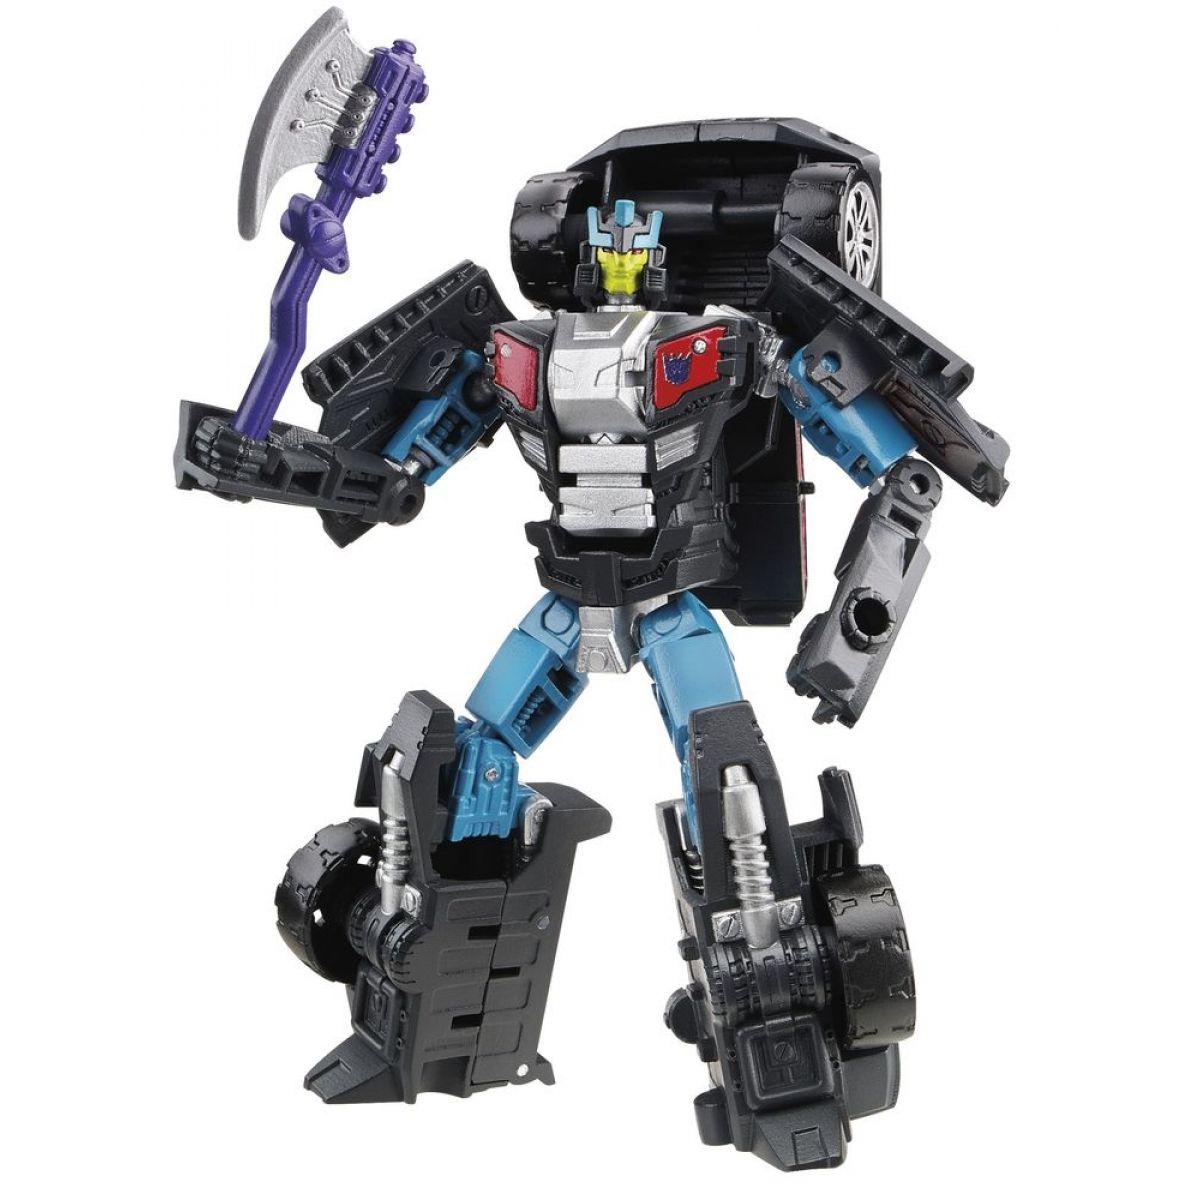 Hasbro Transformers pohyblivý Transformer s vylepšením - Offroad